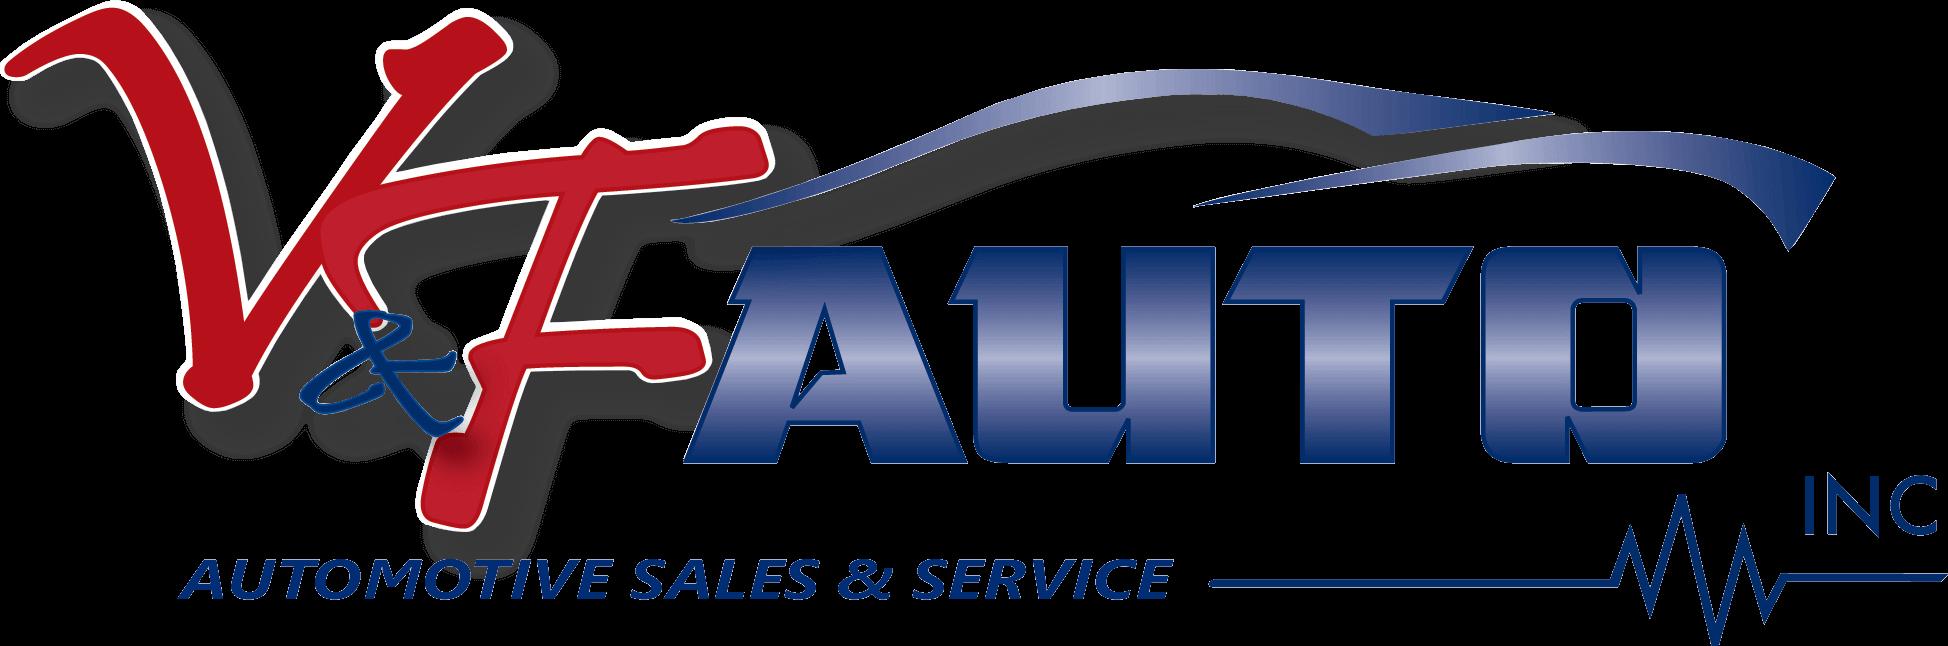 V&F Auto Inc